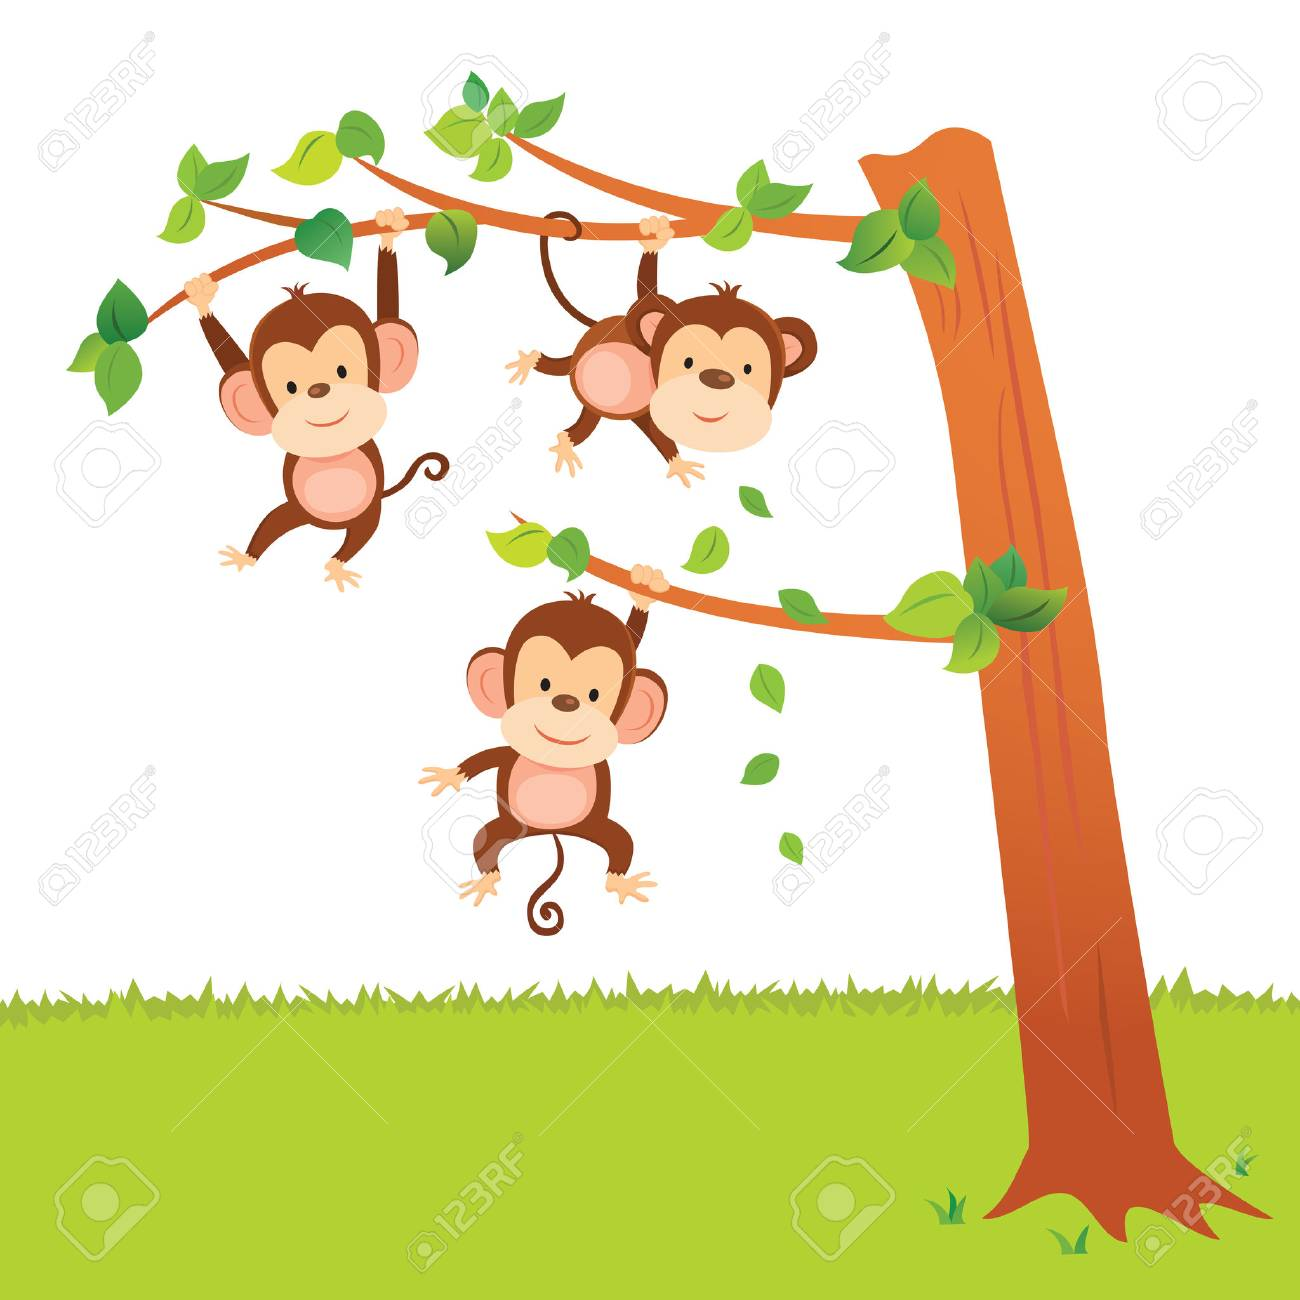 Monkeys swinging in a tree have fun activities..